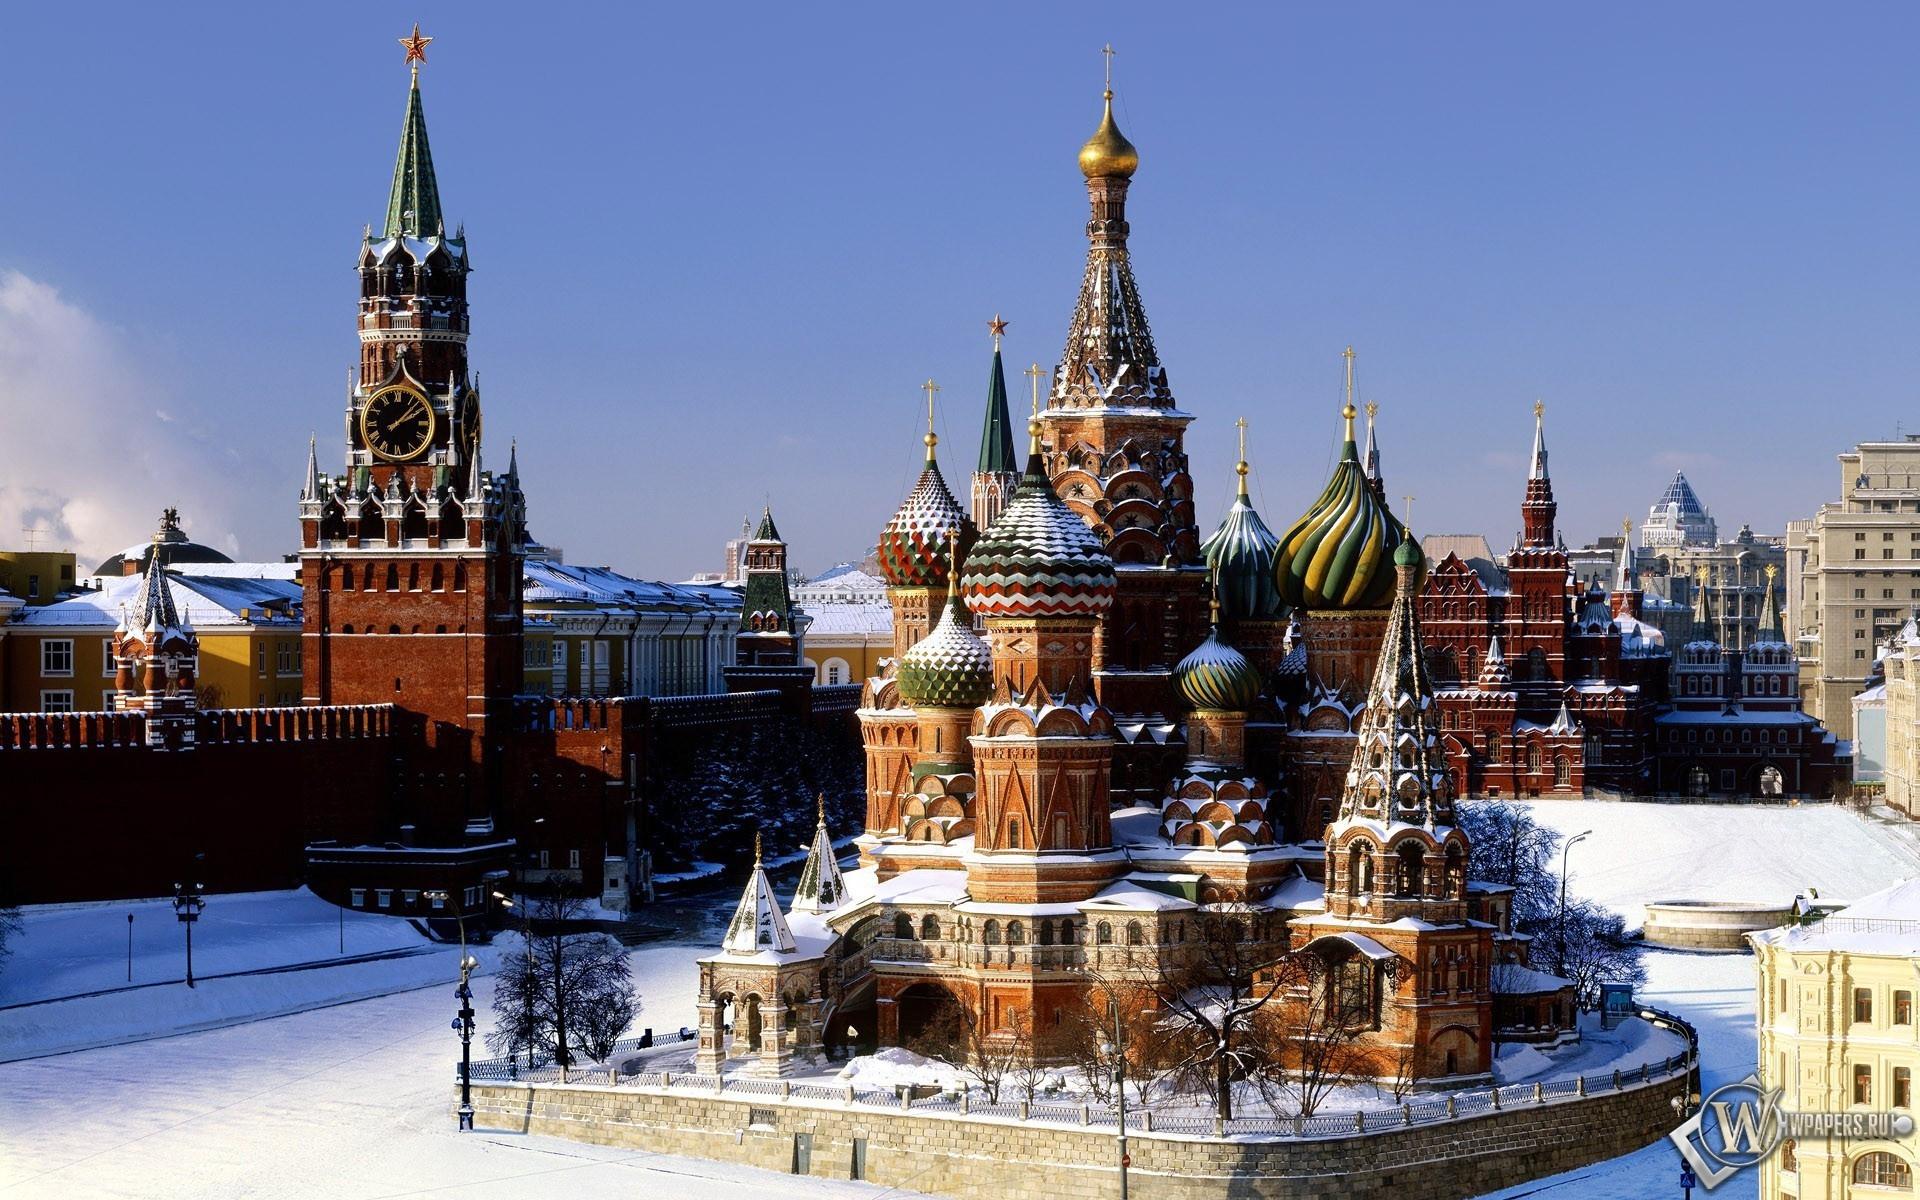 Москва храм кремль москва 1920x1200